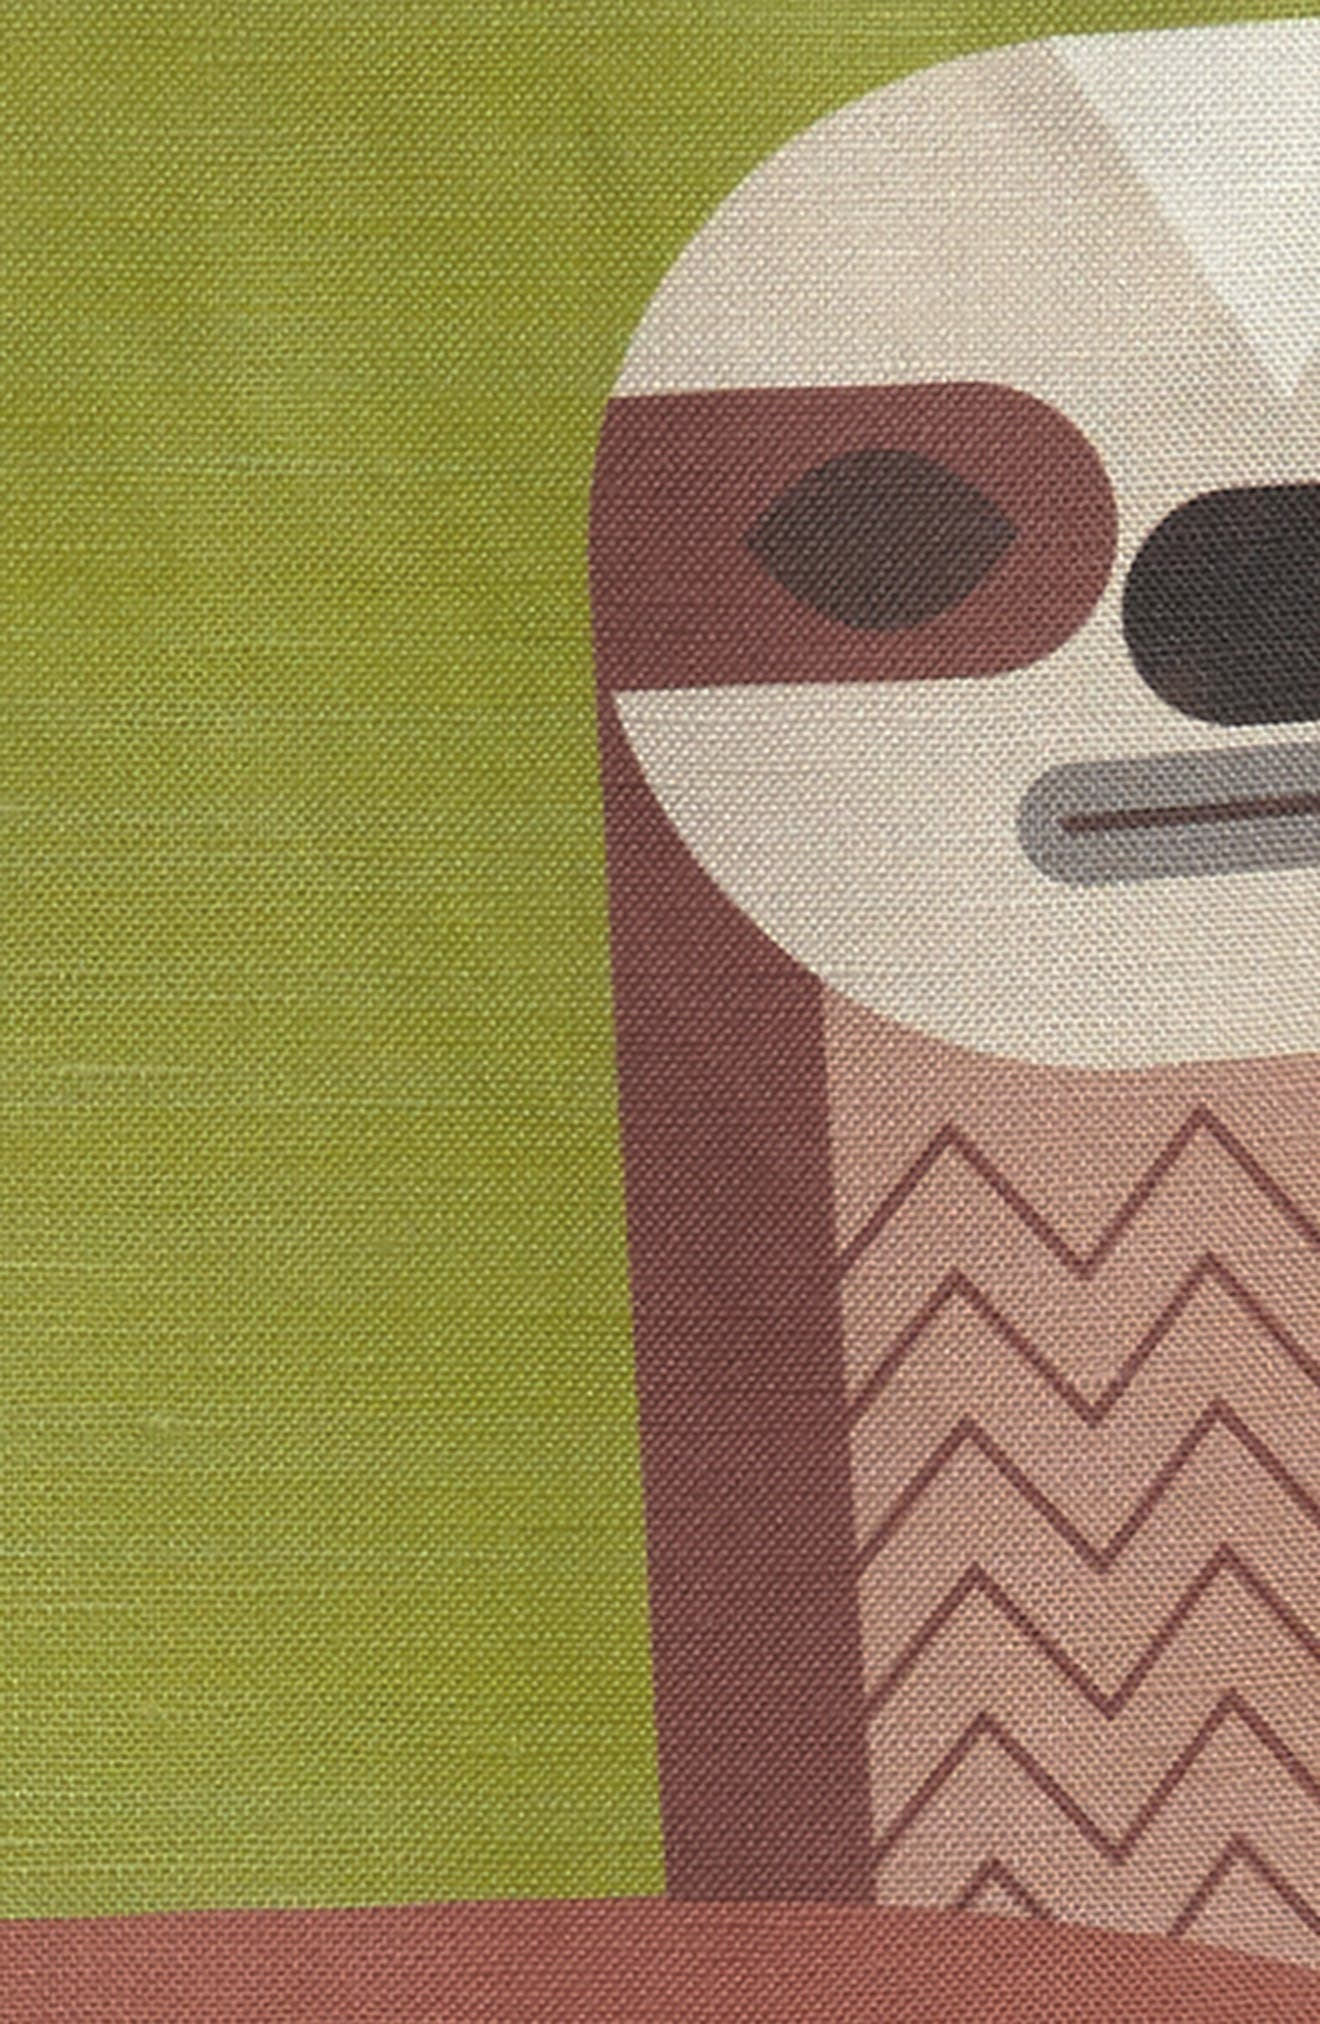 Sloth Shift Dress,                             Alternate thumbnail 3, color,